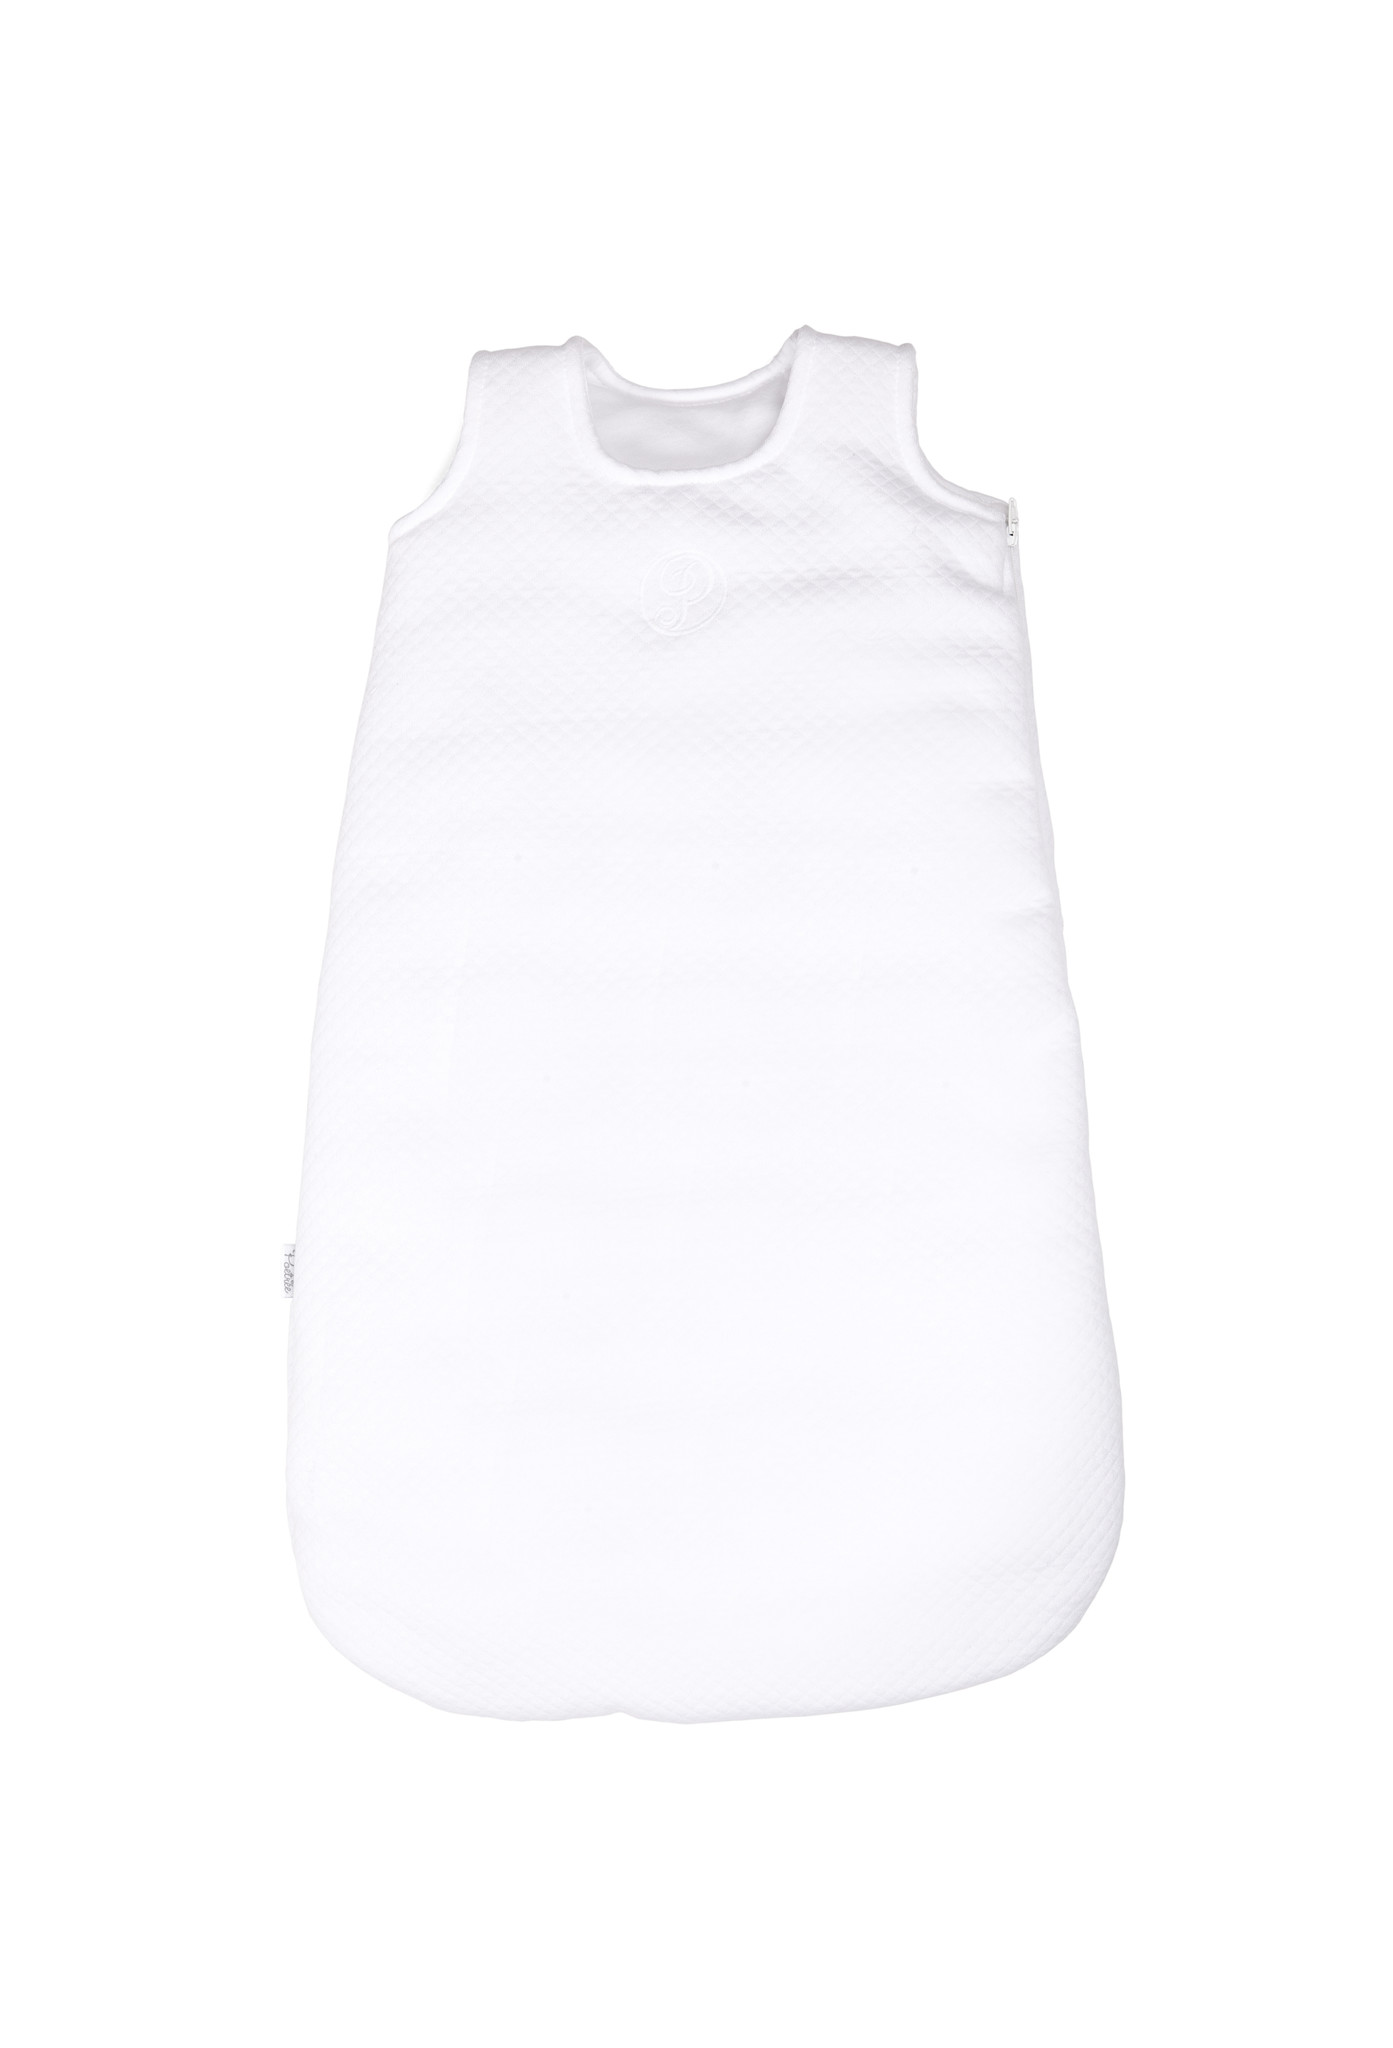 Serenity Jersey New Born Sleeping Bag 65cm Summer-1